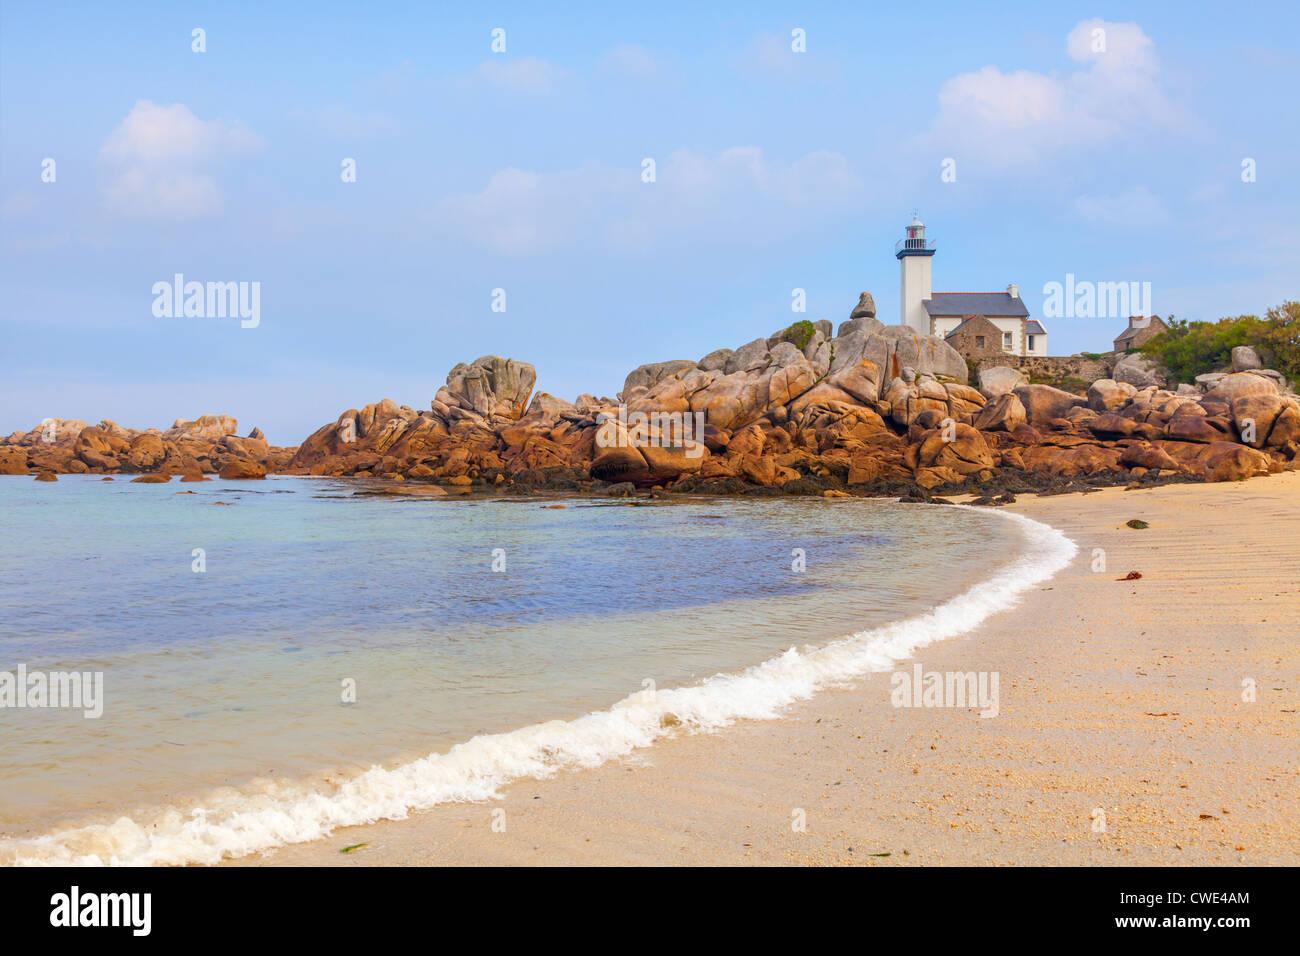 Pontusval Lighthouse, Brignogan Plage, Finistere, Brittany, France. - Stock Image